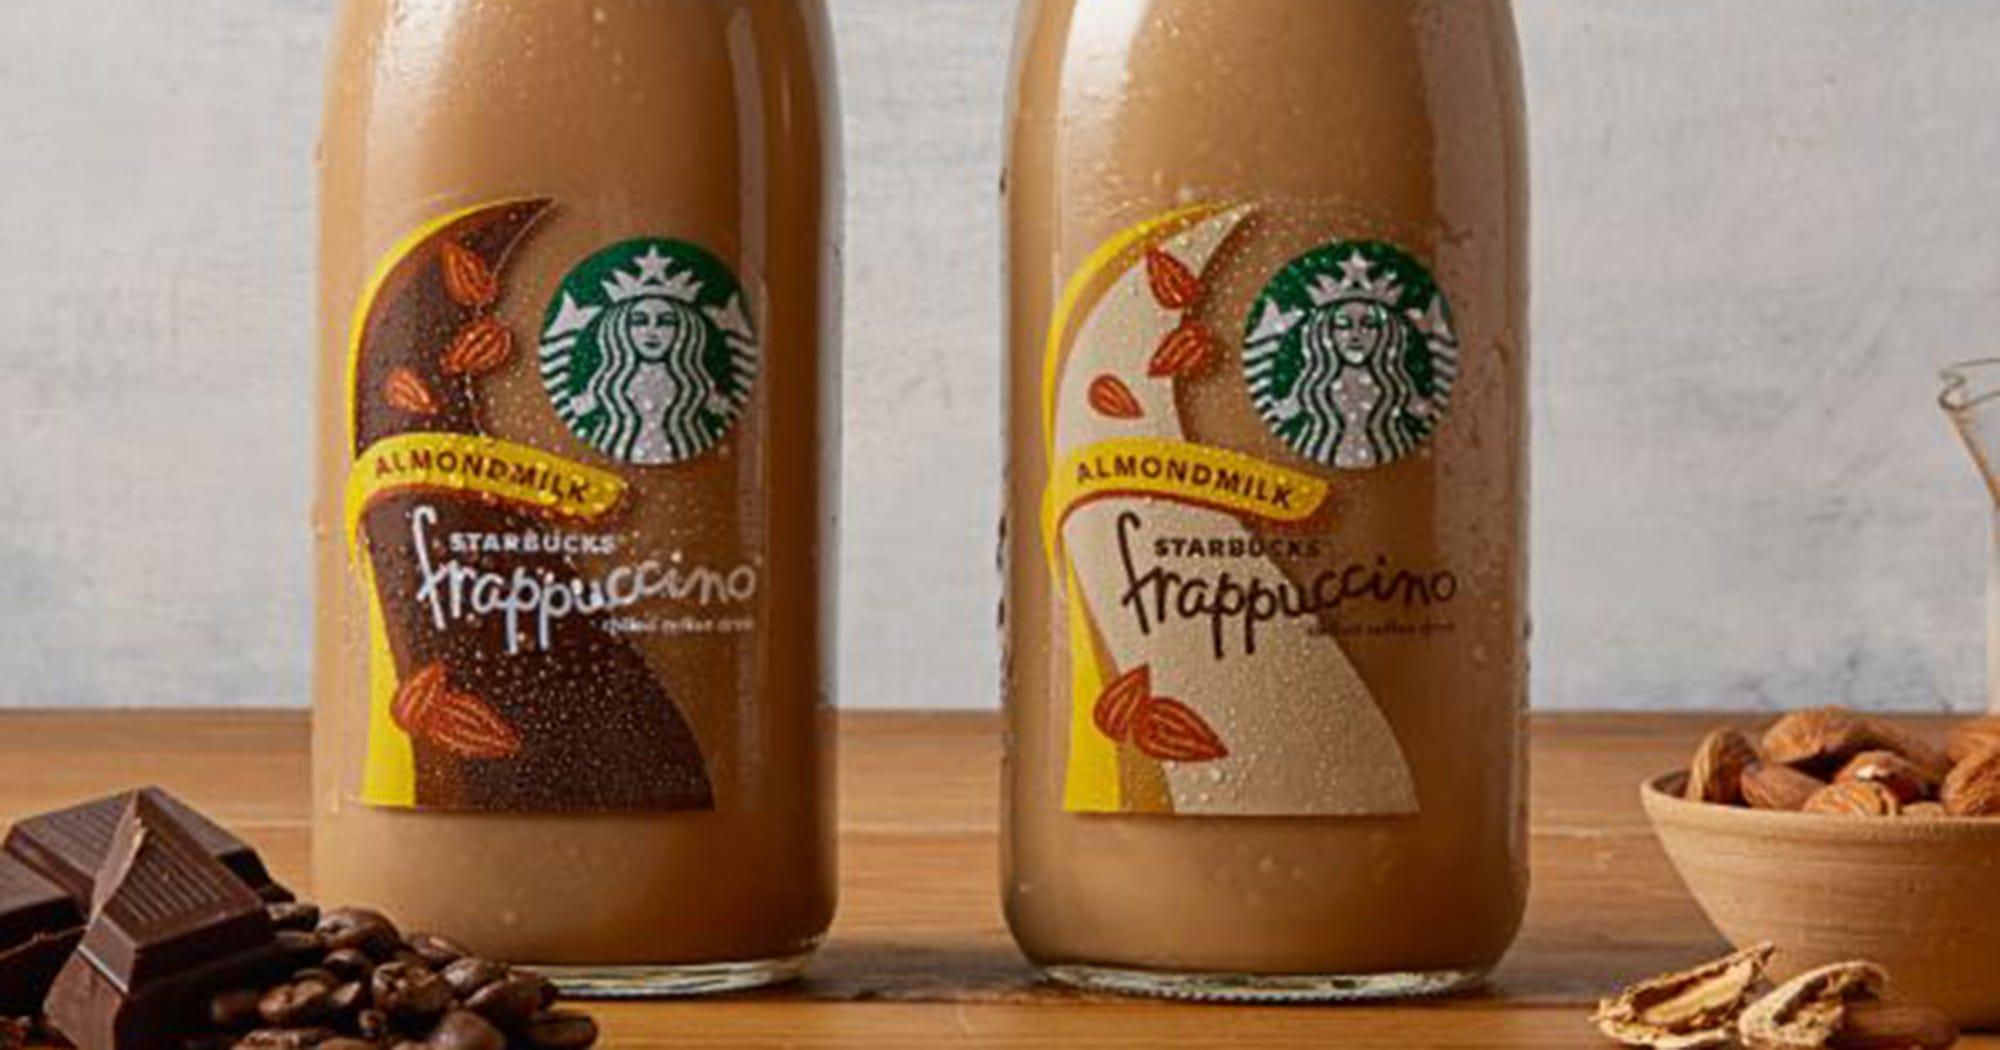 Starbucks Bottled Almond Milk Frappuccinos